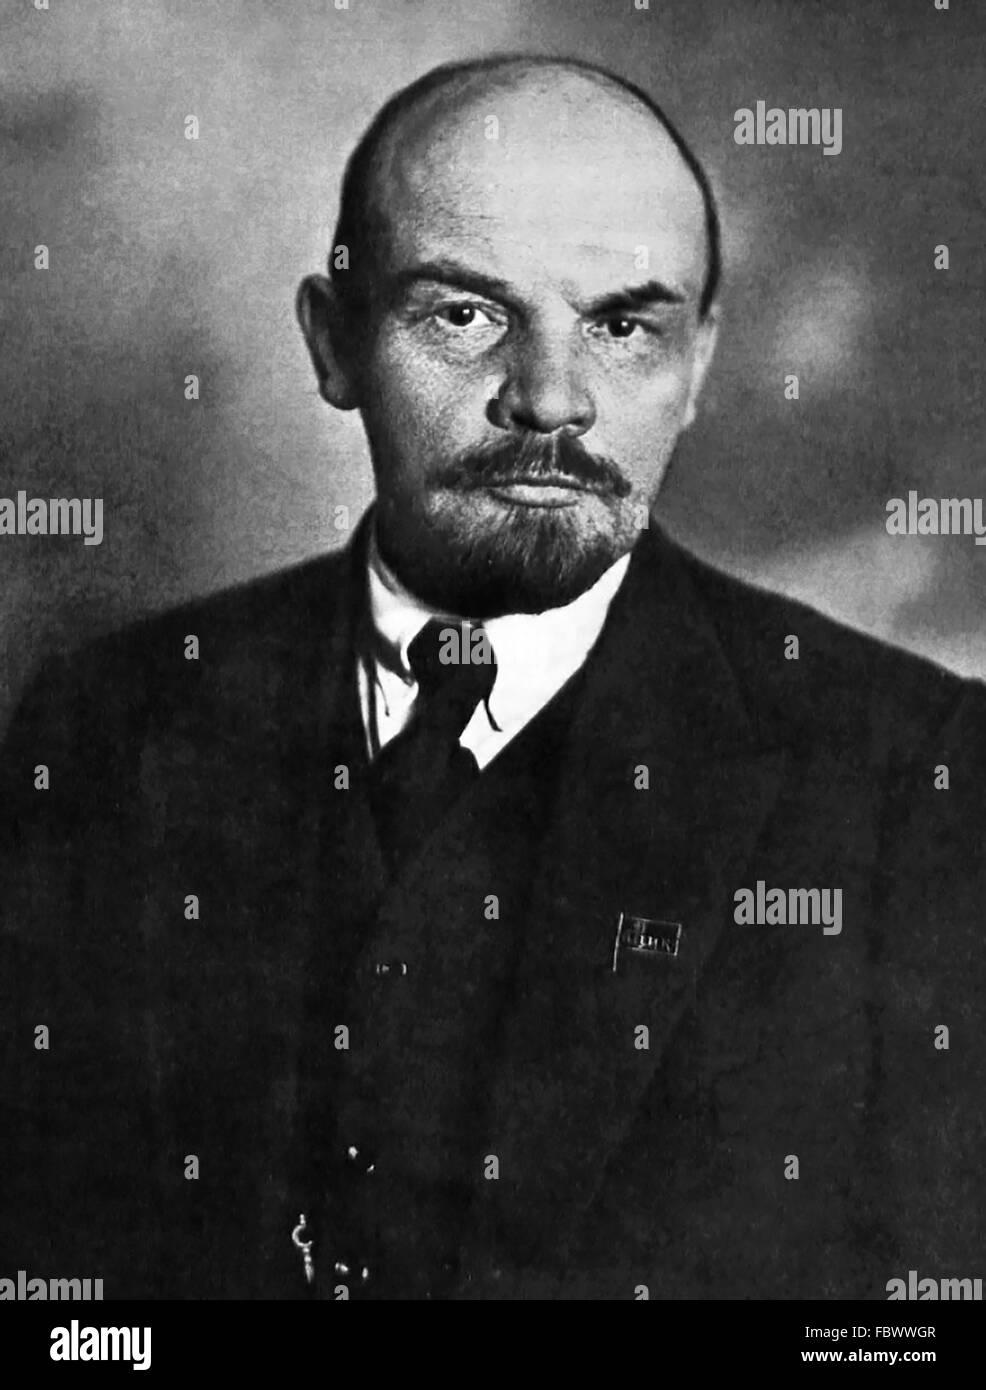 Lenin. Portrait of Vladimir Lenin (Vladimir Ilyich Ulyanov), Chairman of the Council of People's Commissars - Stock Image